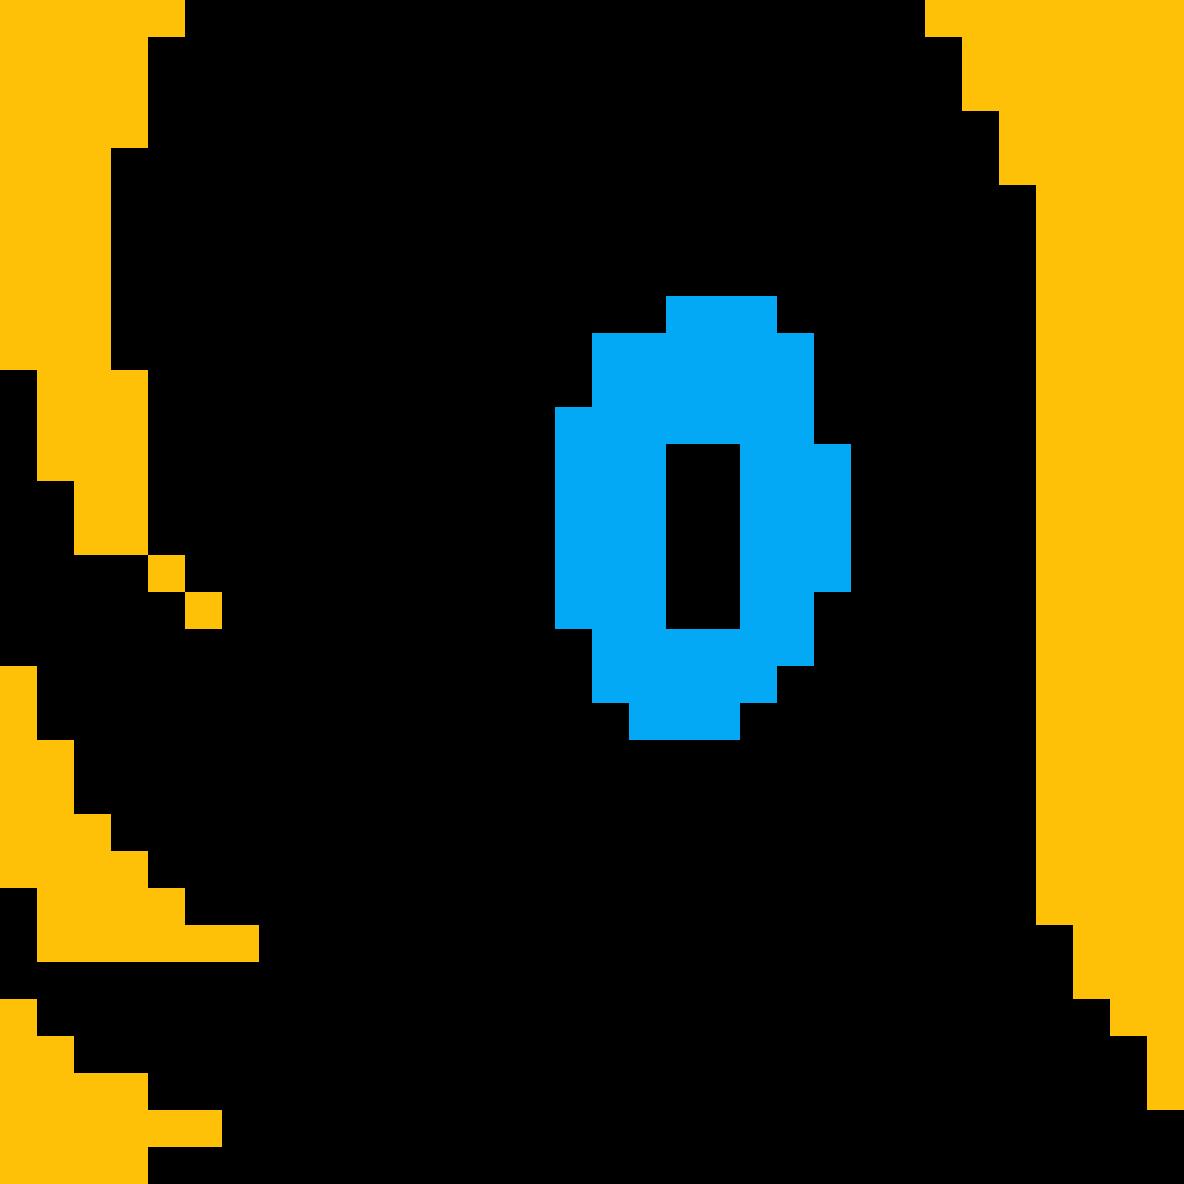 Simple Pixel Eye by Steph-Draws